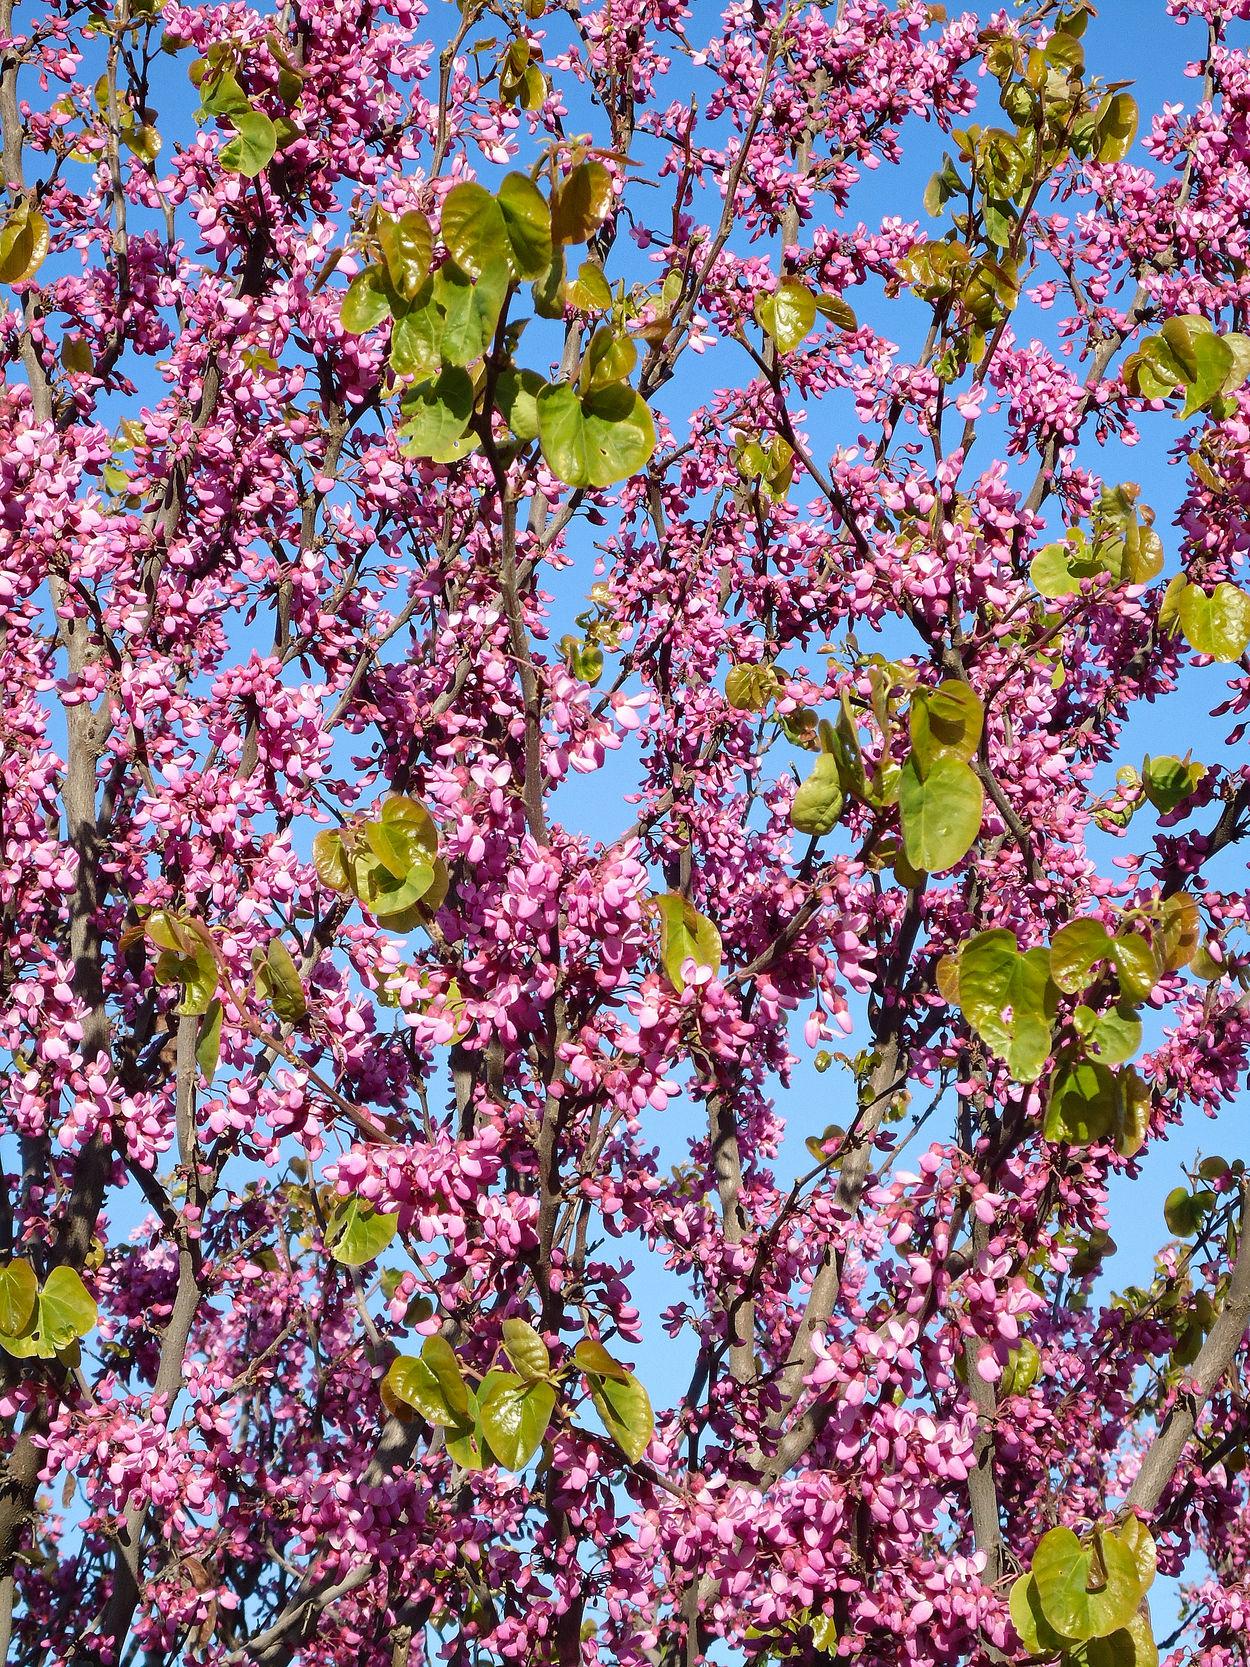 Cercis siliquastrum. April Bloom Blooming Blue Sky Branches Cercis Siliquastrum Exuberant Flowerets Flowers Freshness Leaves Lilac Lush Nature Pattern Pink Pink-purple Flowering Branches Pink-violet Purple Purple Flowers Spring Tree